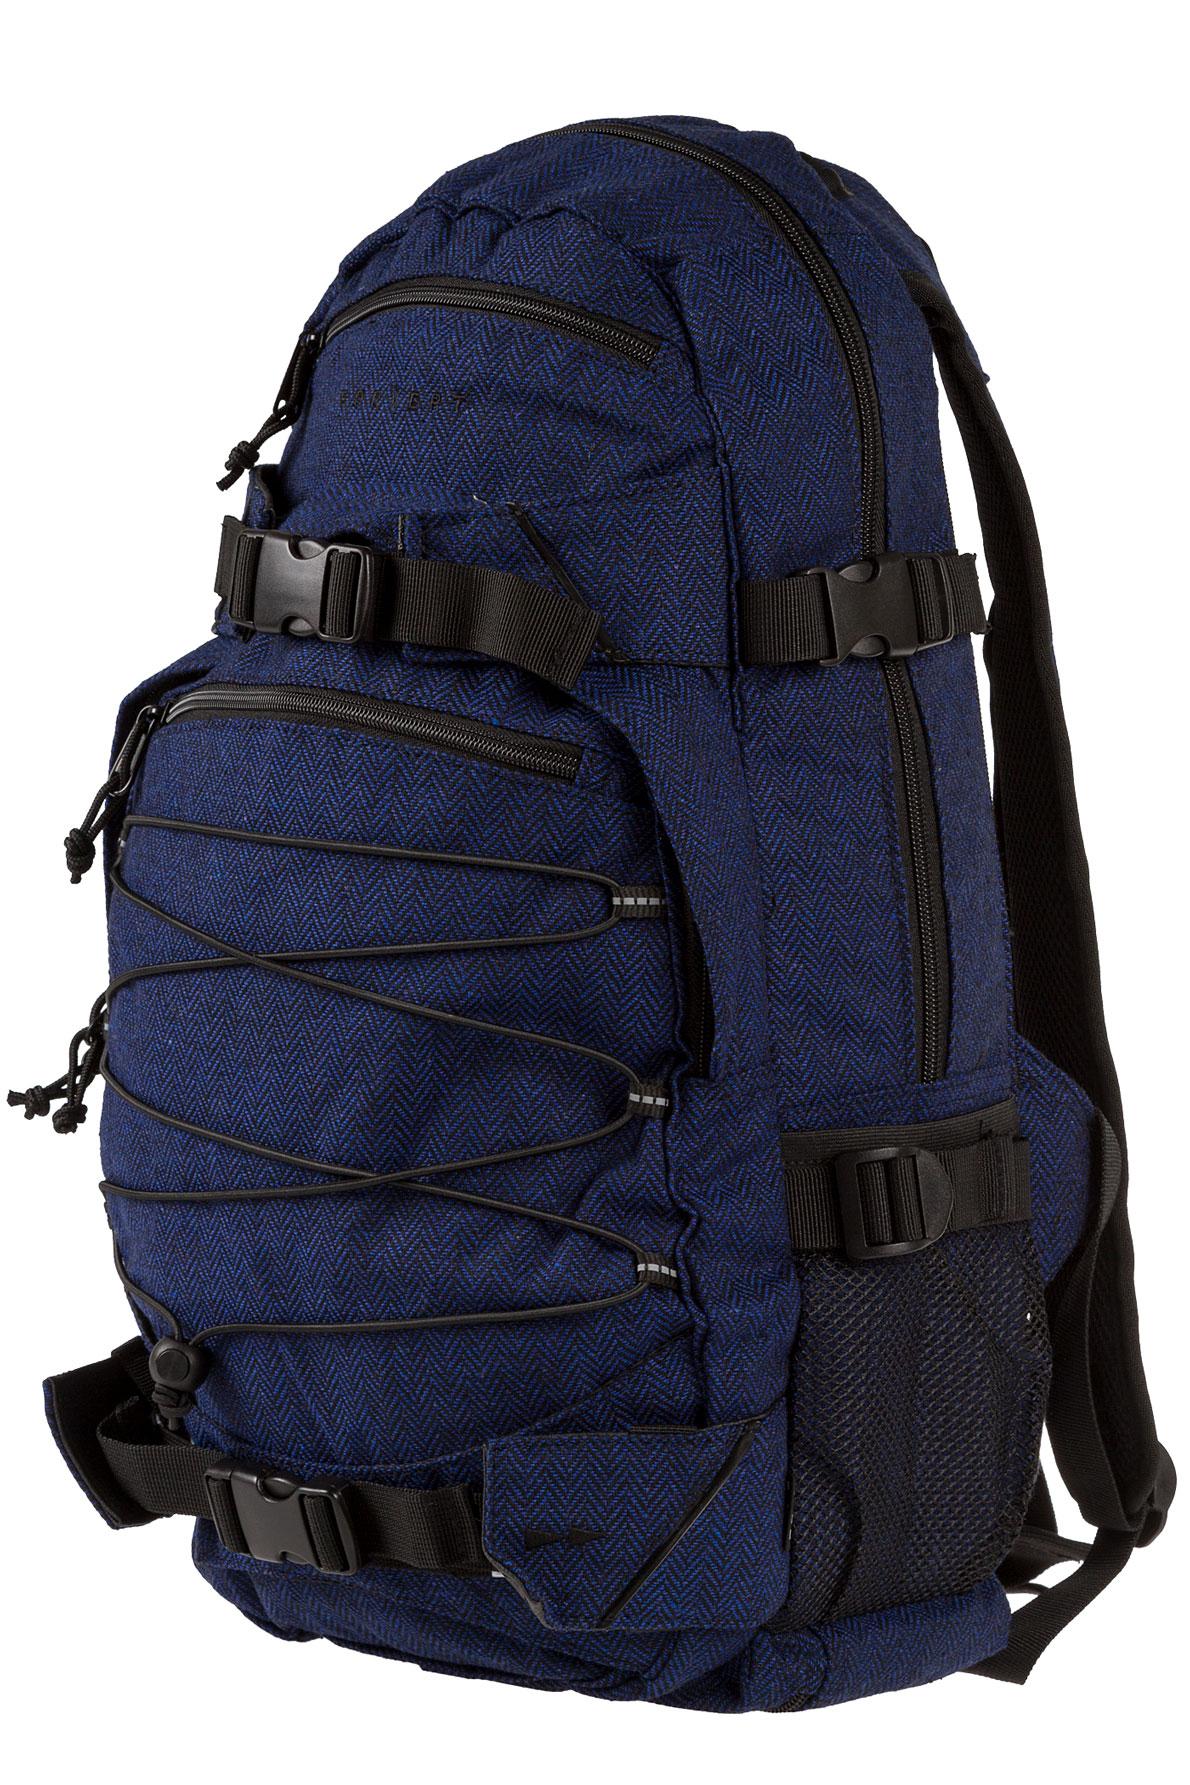 forvert new louis backpack 20l flannel navy buy at skatedeluxe. Black Bedroom Furniture Sets. Home Design Ideas